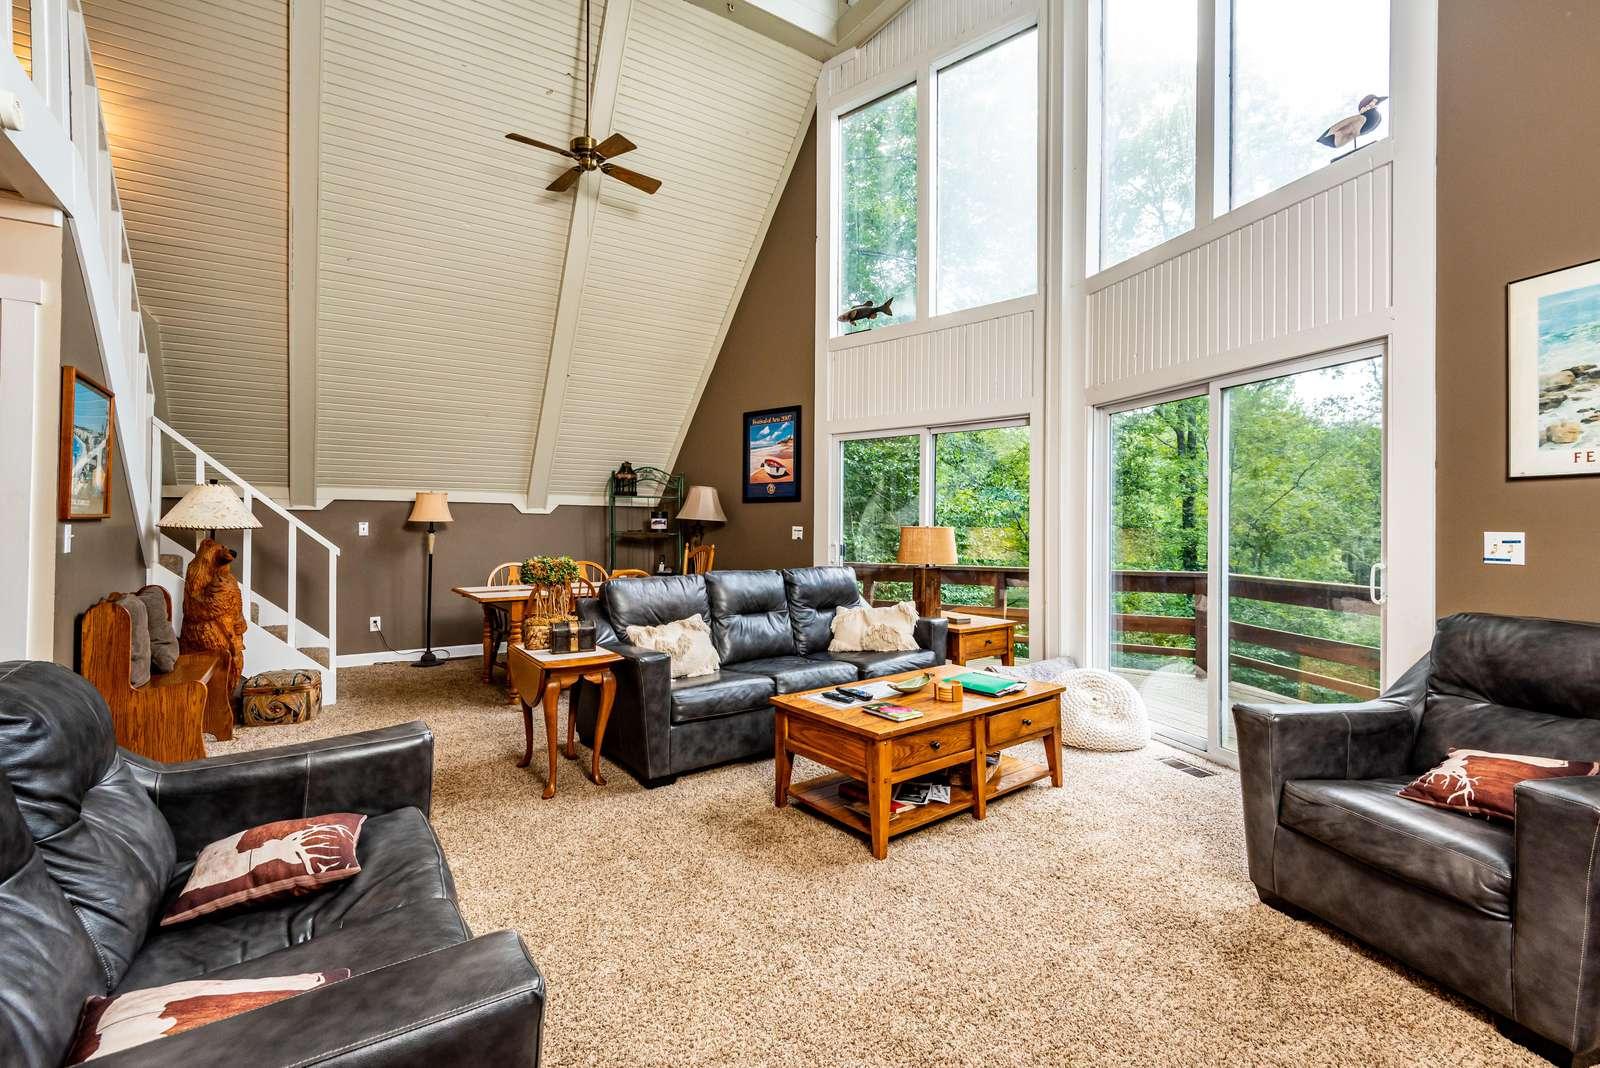 Laguna House Vacation Rental - property